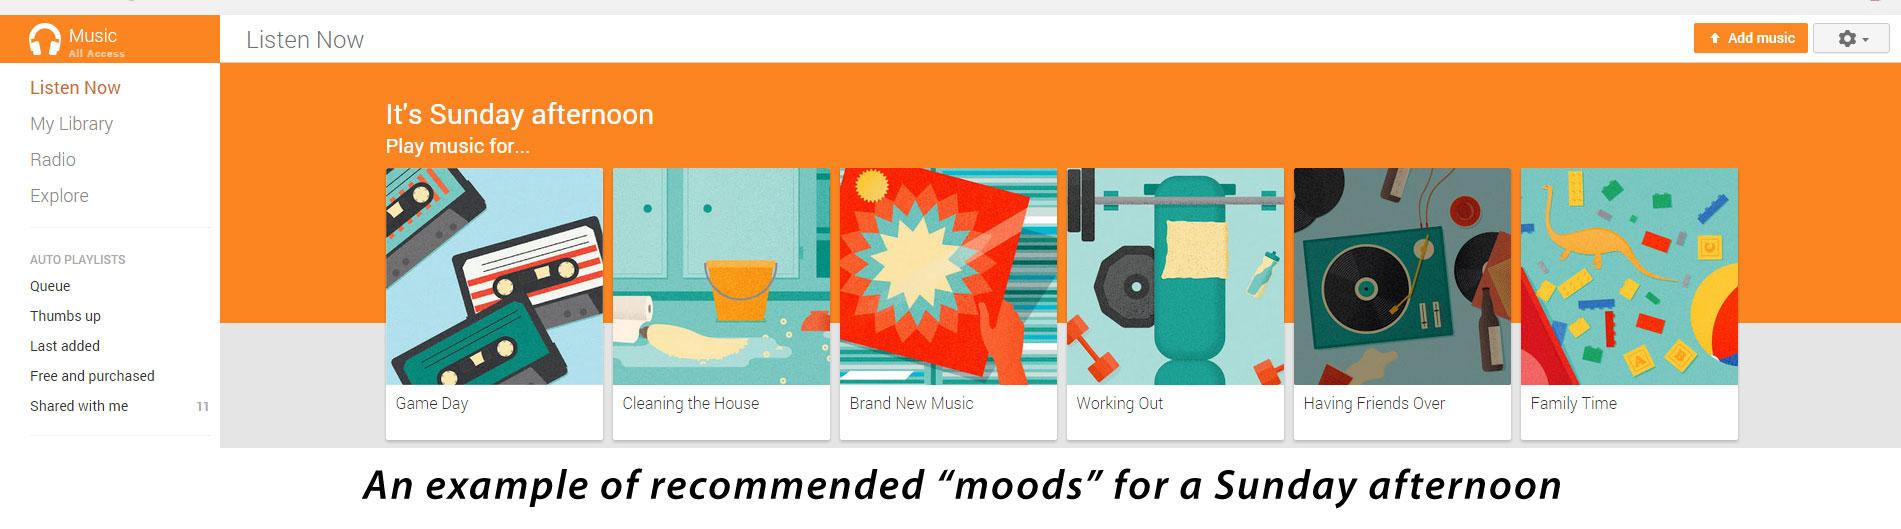 Google Play music moods